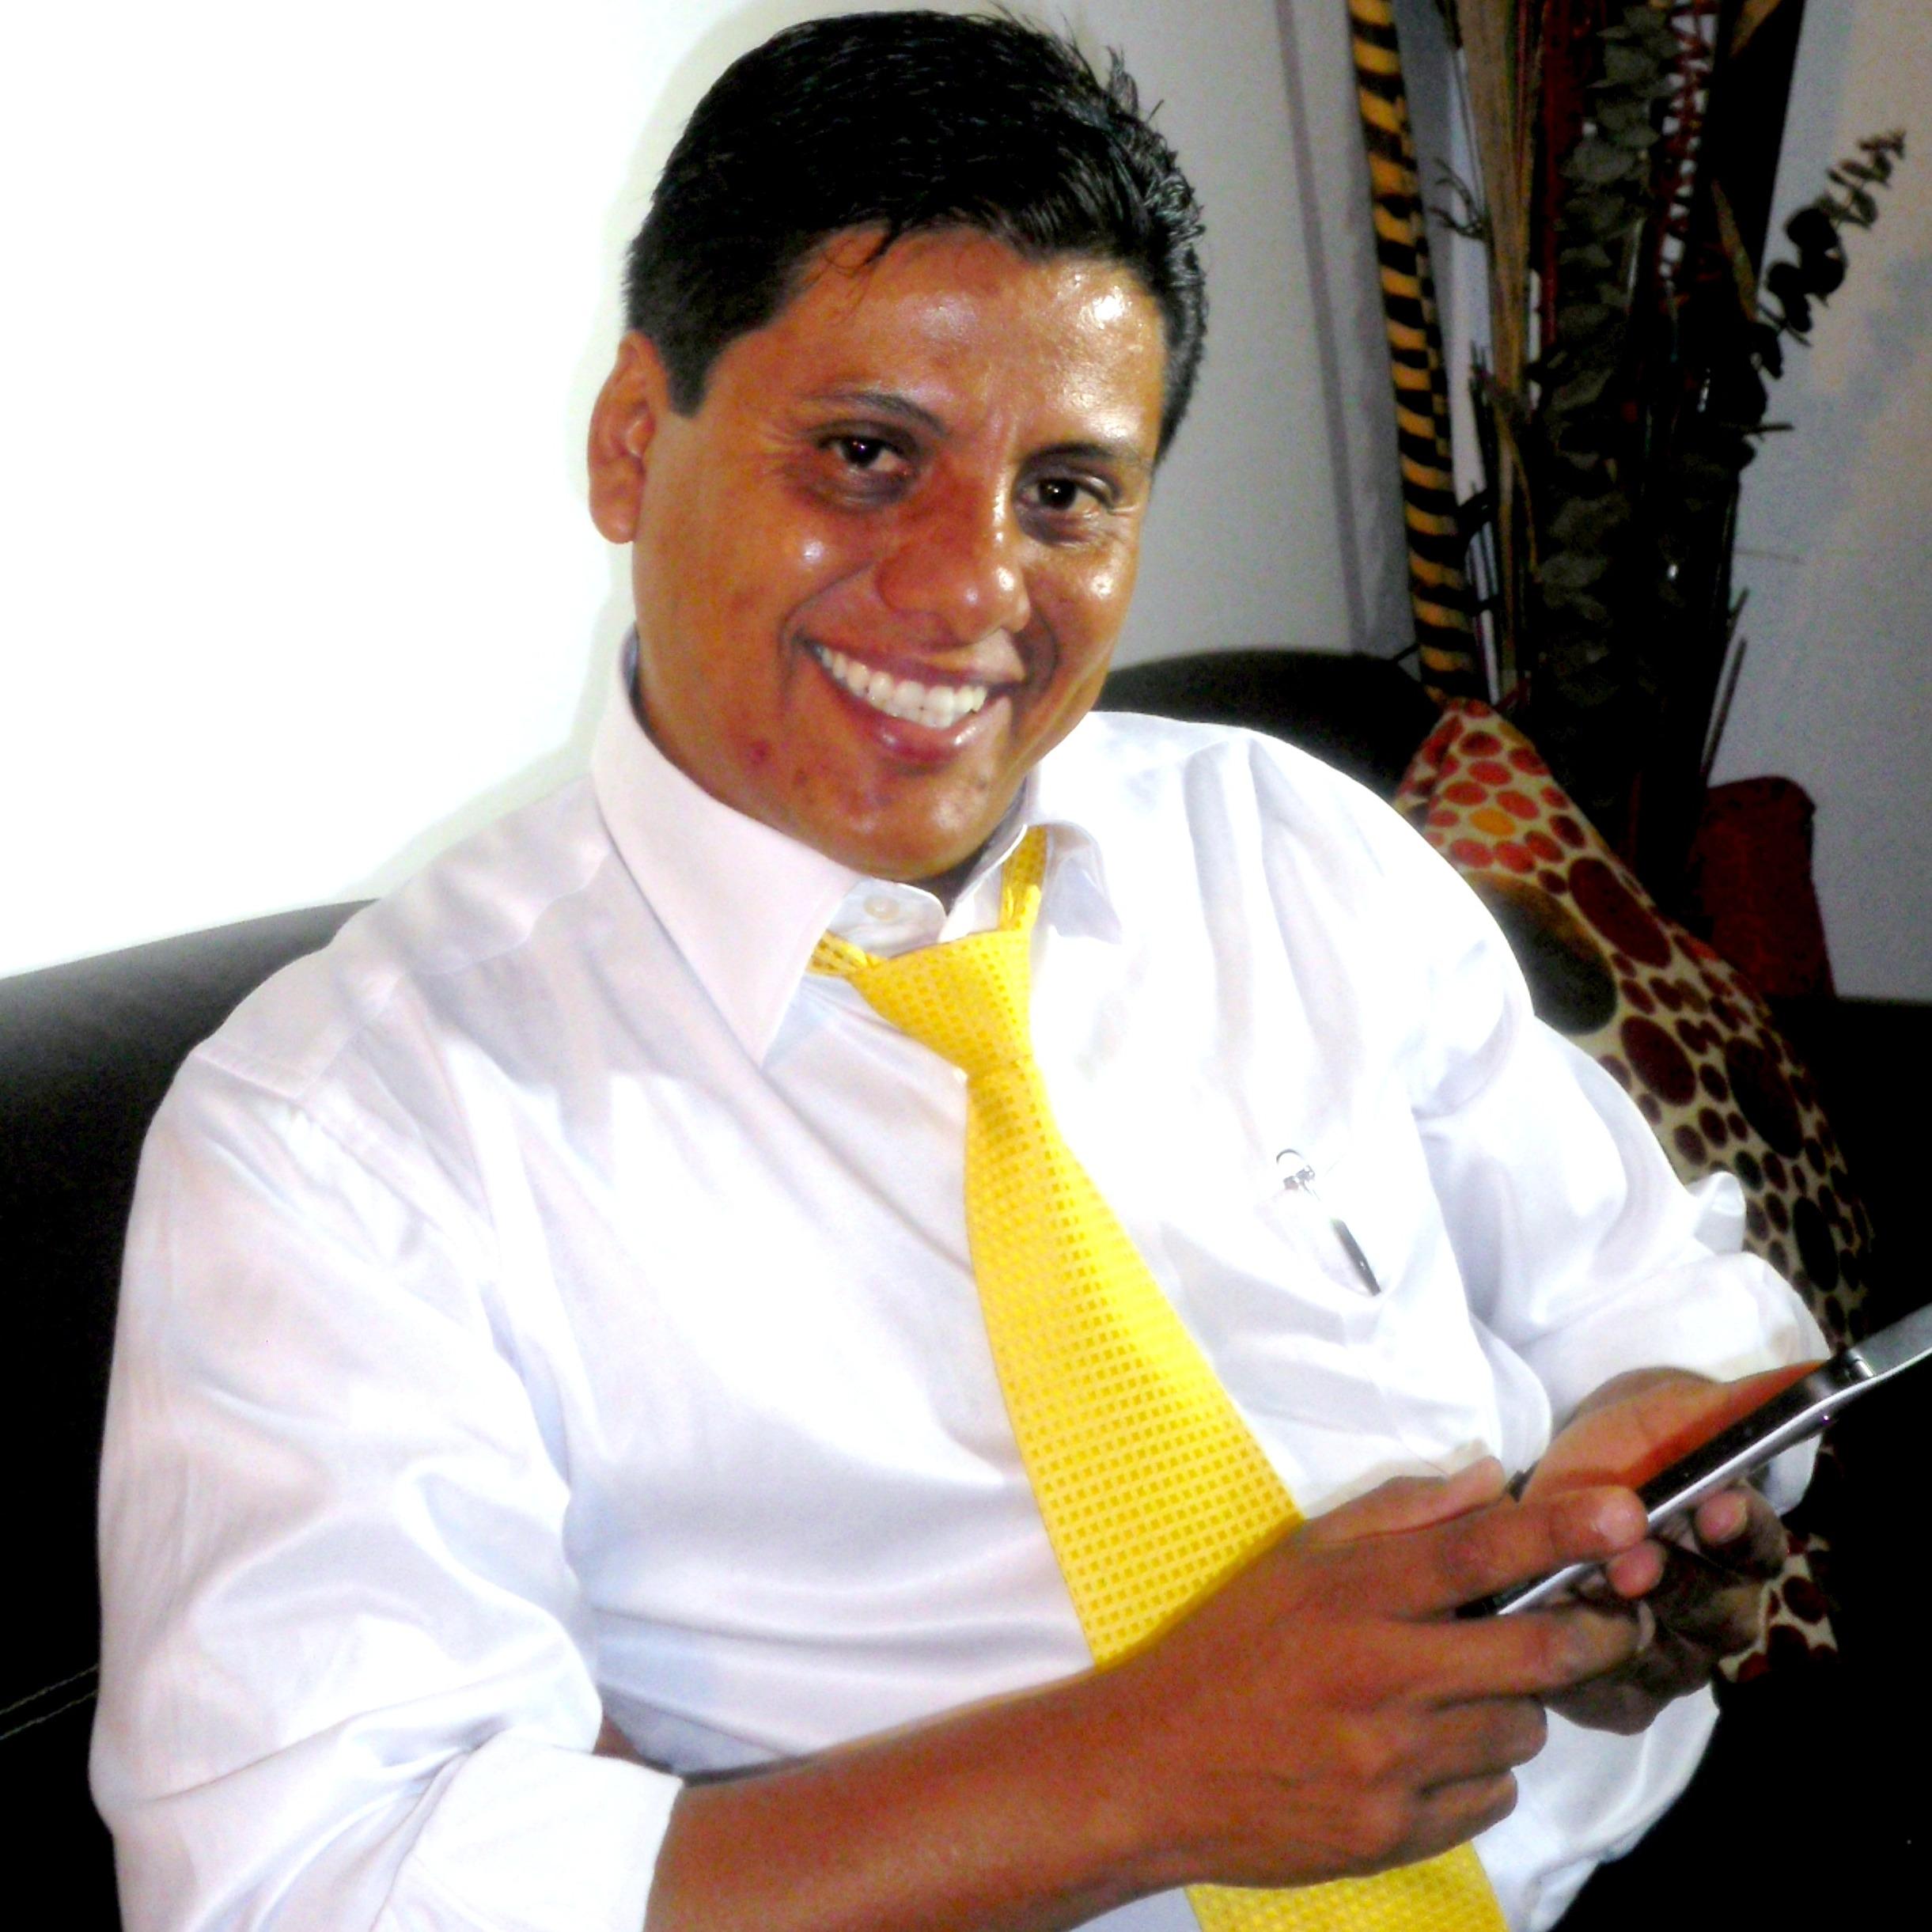 Juan Obregón Hernández